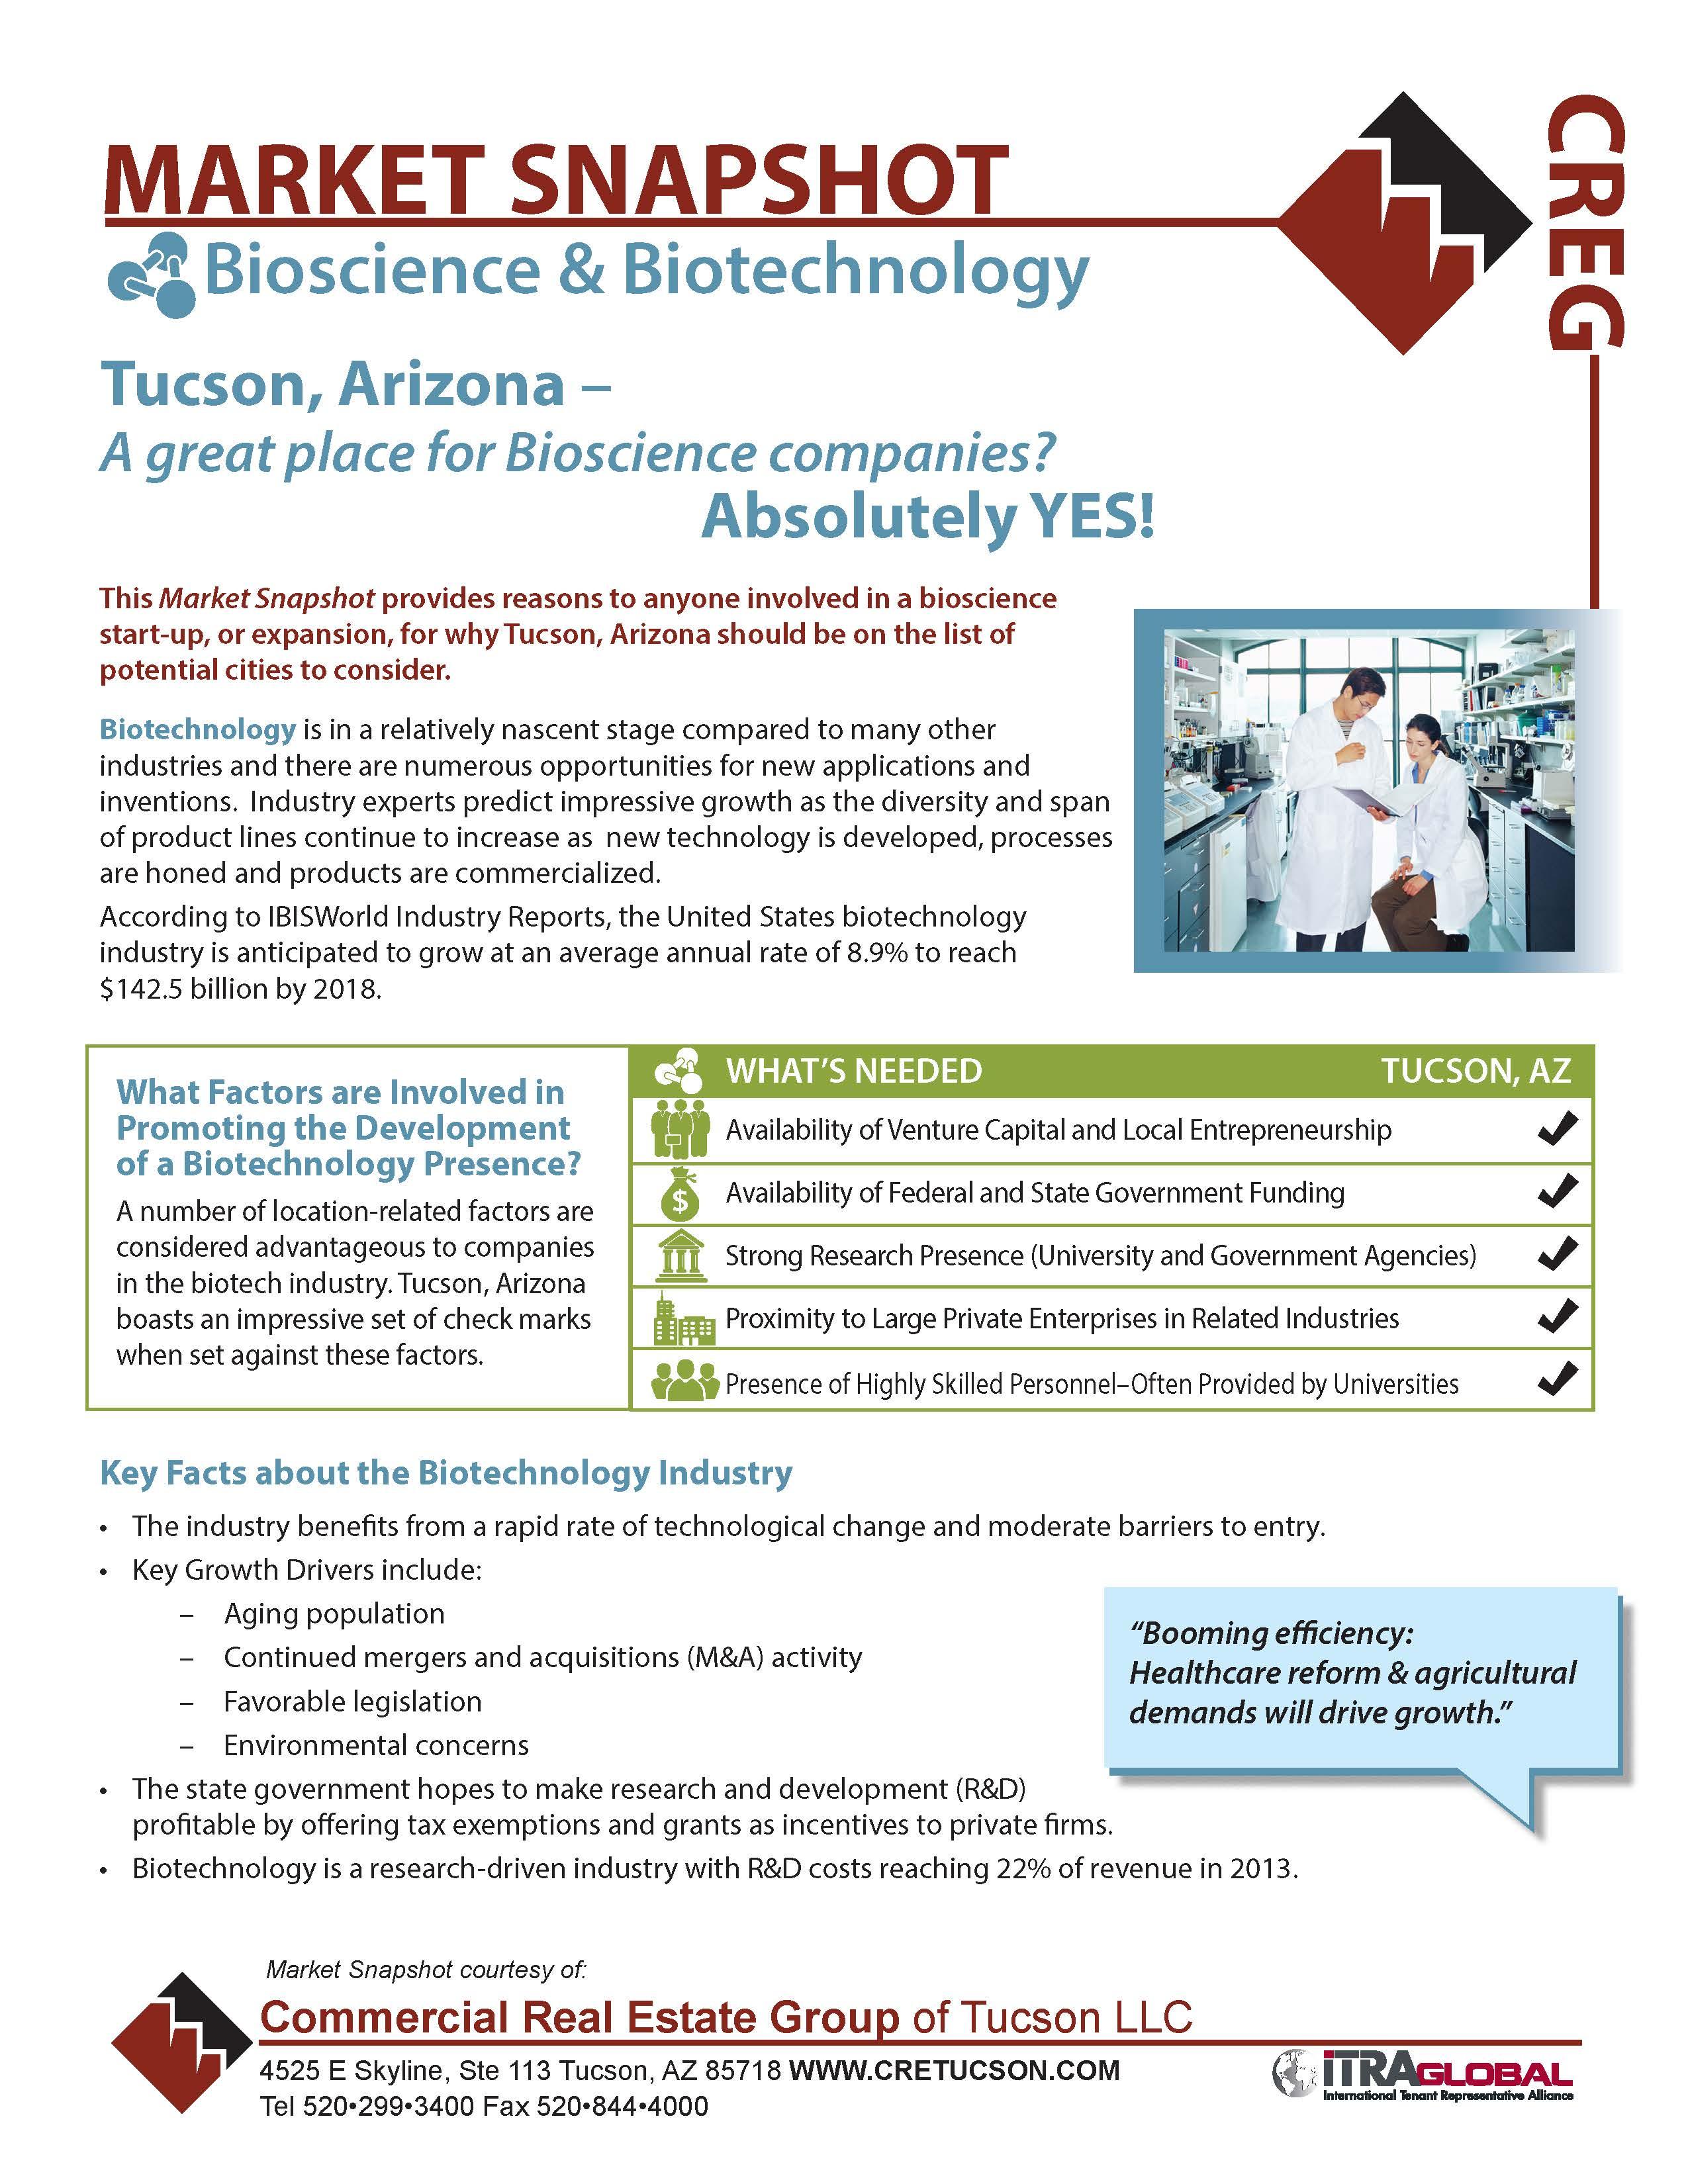 Bio Market Snapshot for Tucson, Arizona